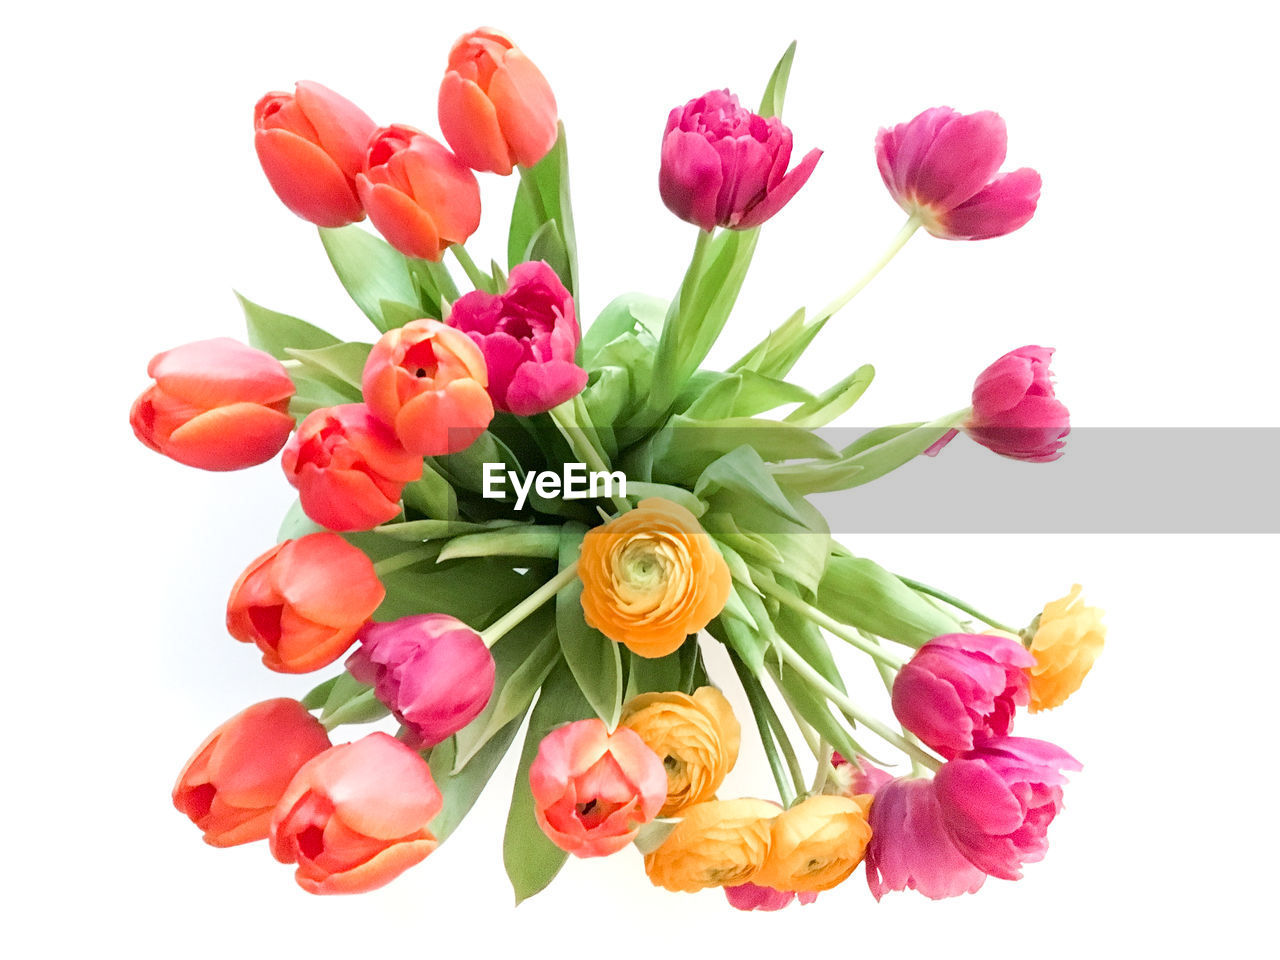 flower, white background, petal, rose - flower, freshness, pink color, fragility, flower head, beauty in nature, tulip, bouquet, studio shot, nature, vase, leaf, springtime, plant, no people, close-up, day